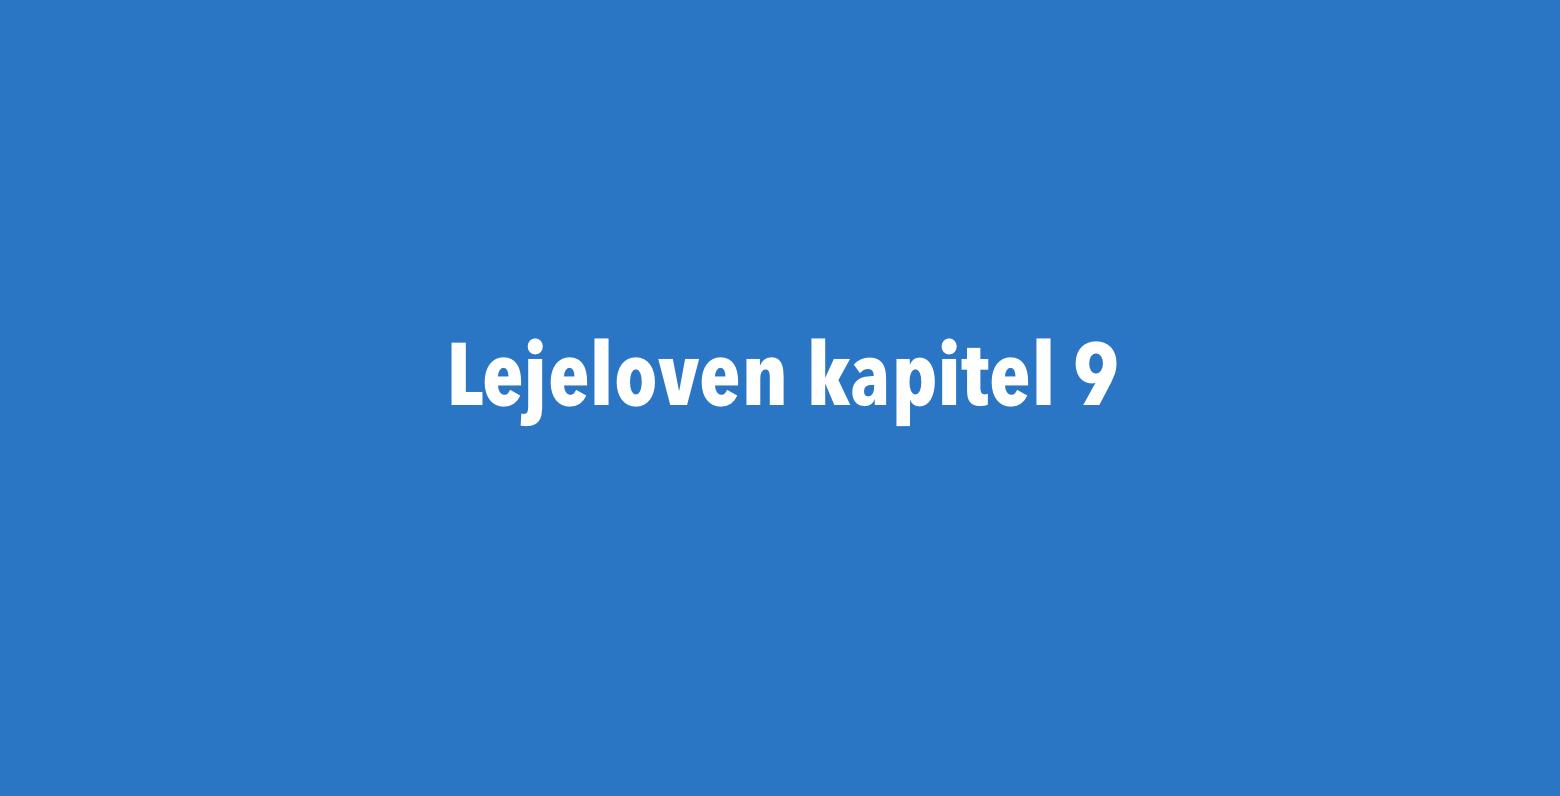 Lejelovens kapitel 9